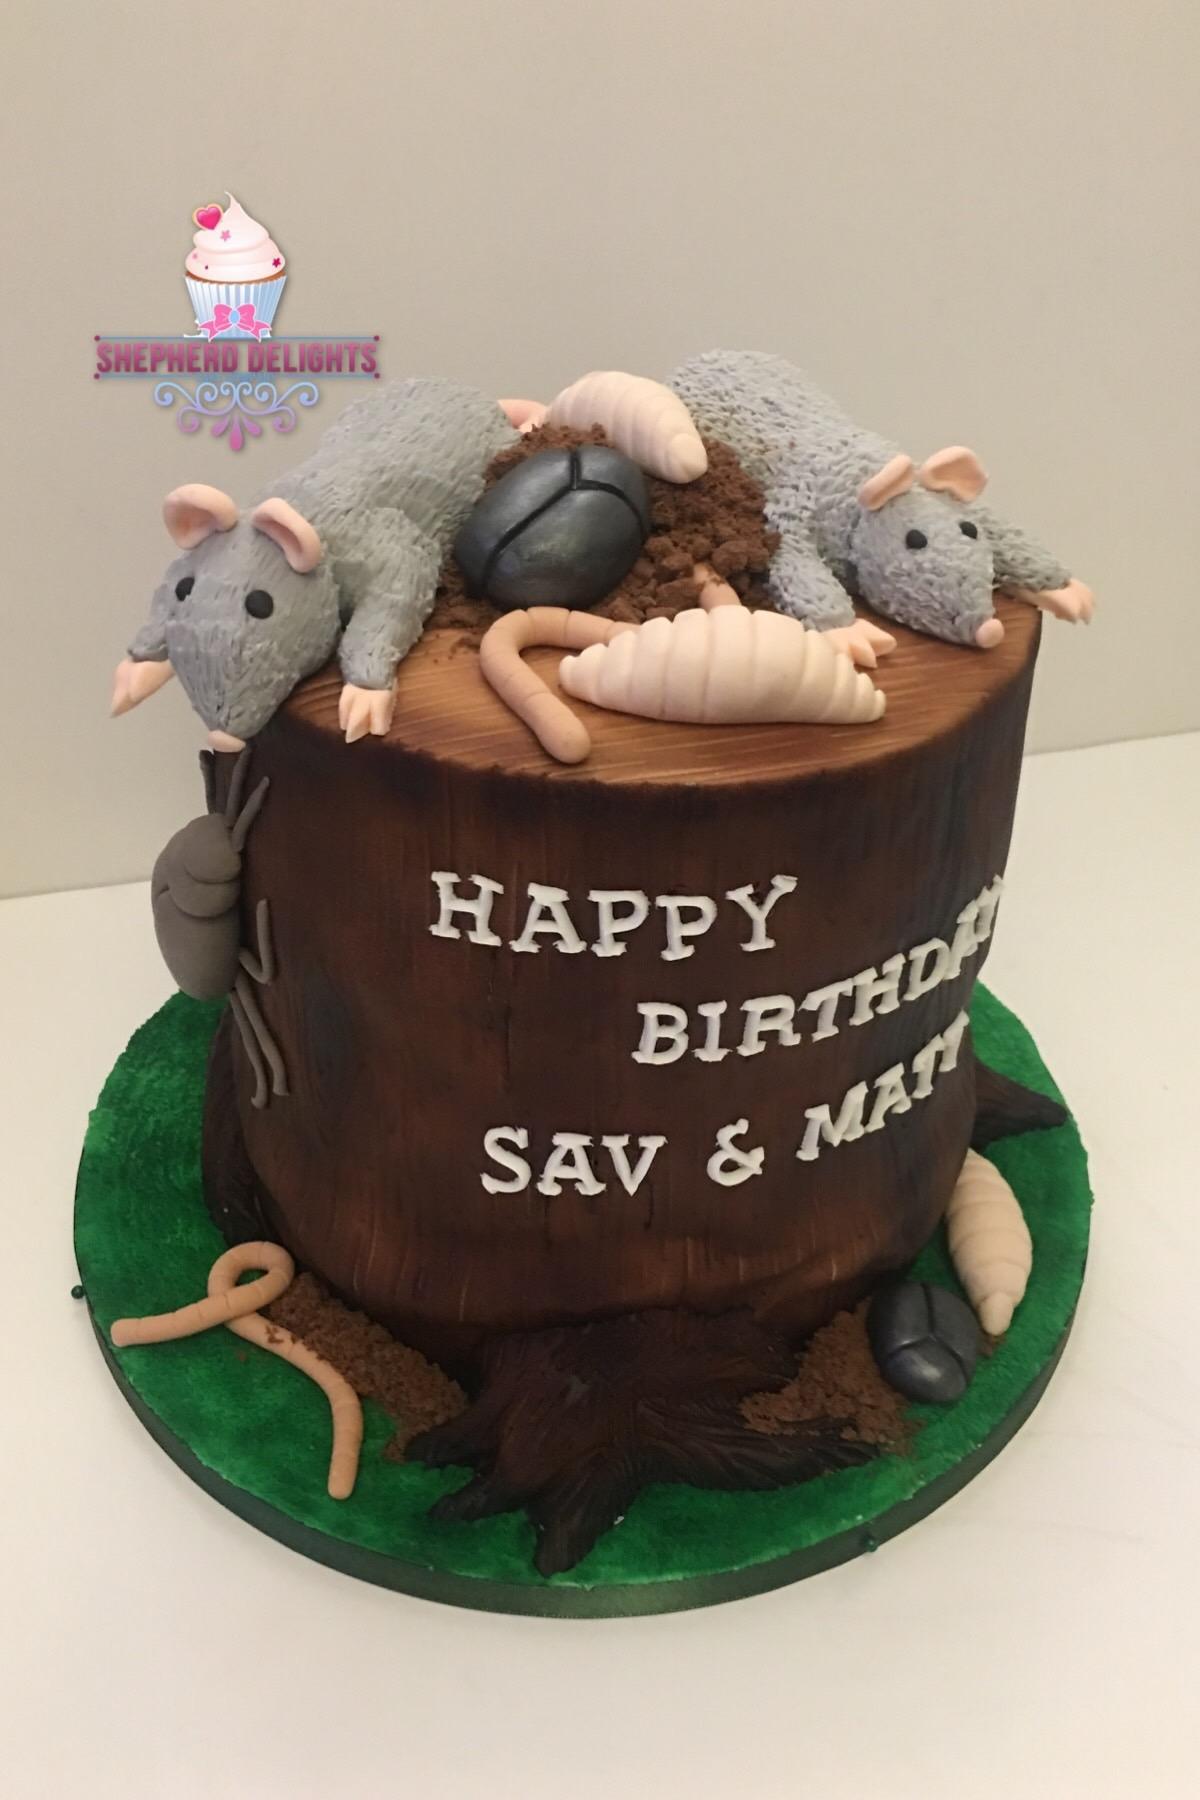 Pleasant Tree Stump Bug Novelty Cakes Novelty Birthday Wedding Cakes Funny Birthday Cards Online Overcheapnameinfo